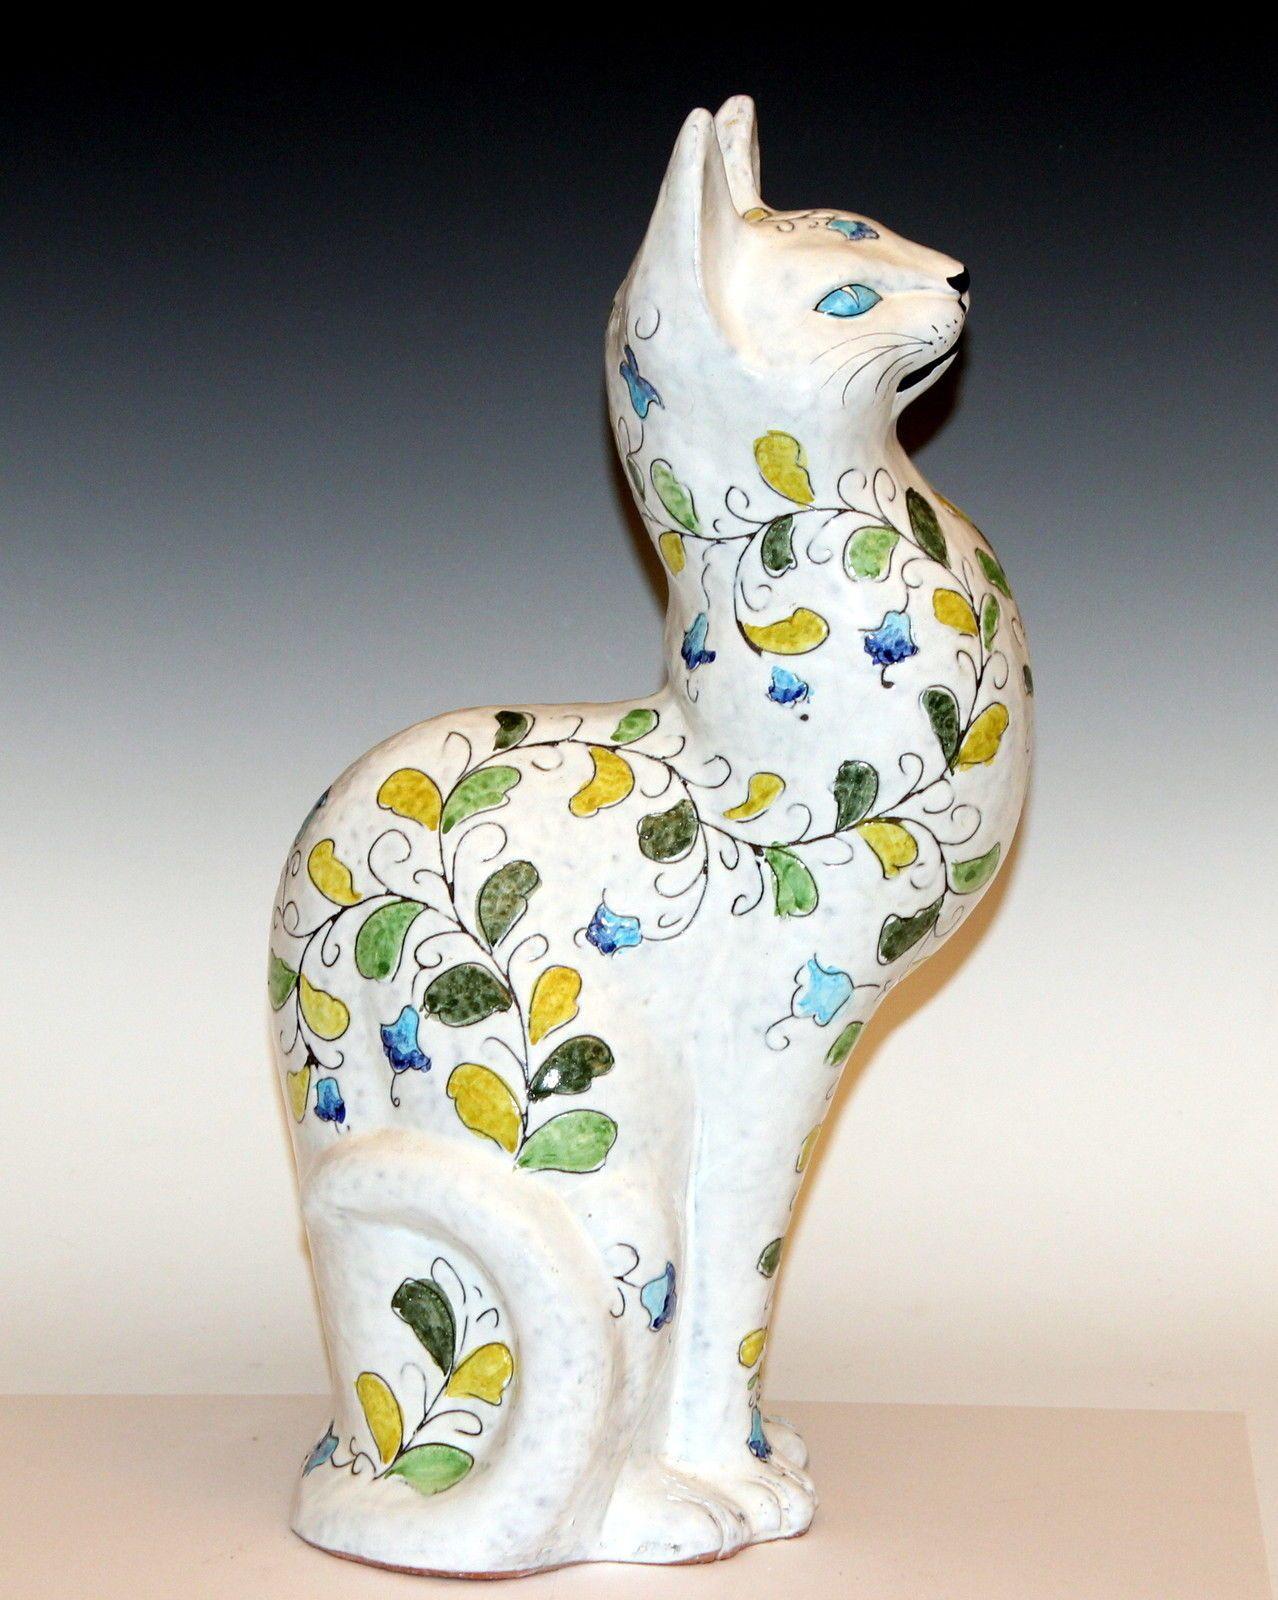 Vintage Italian Art Pottery Cat Figure Incised Floral Bagni Bitossi ...